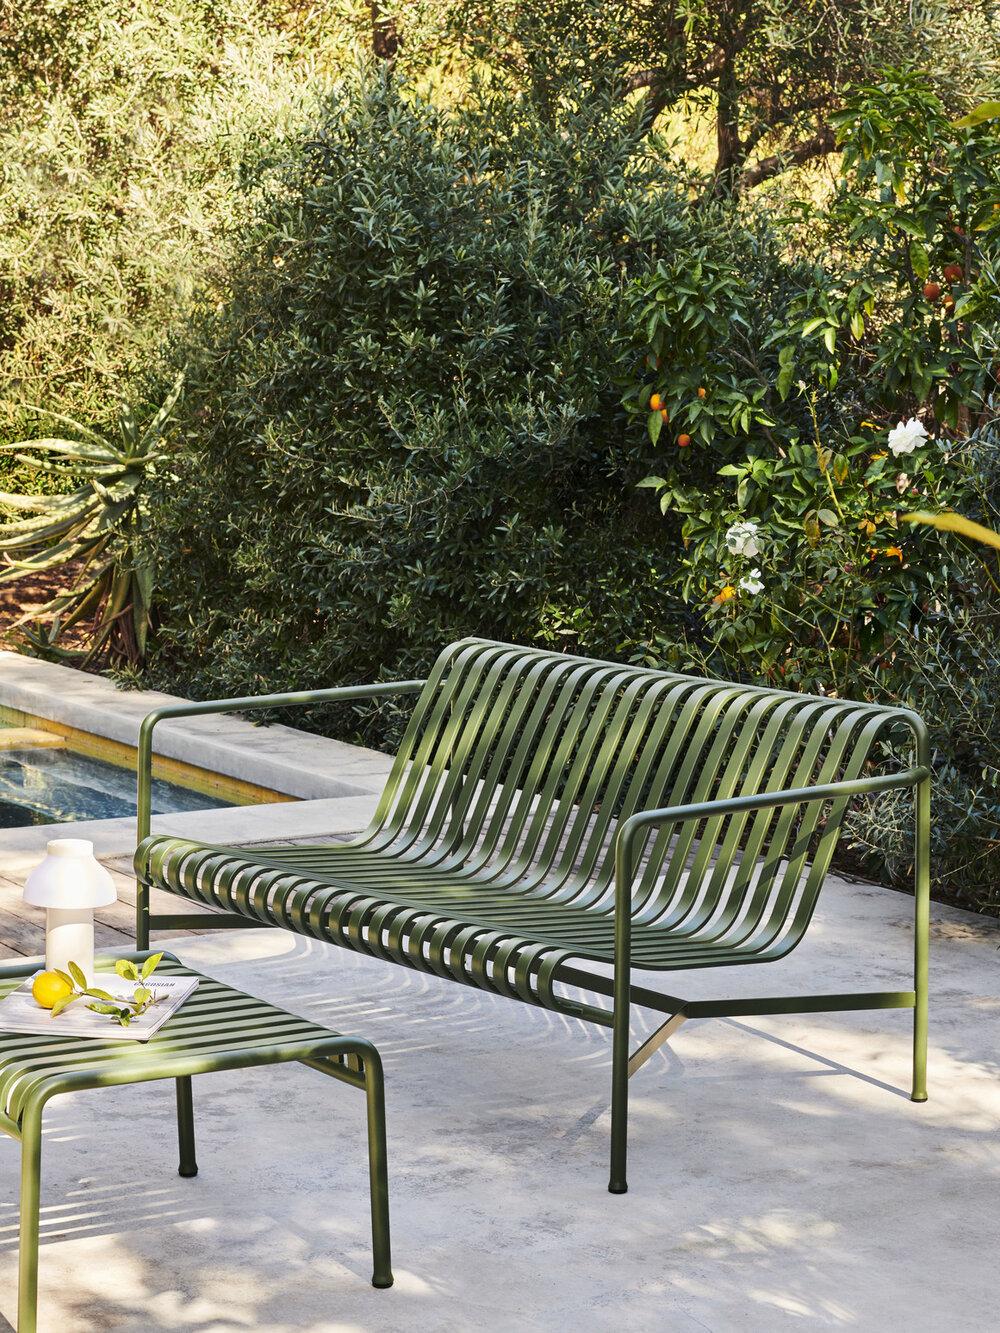 Palissade Lounge Sofa £685 & Ottoman £249